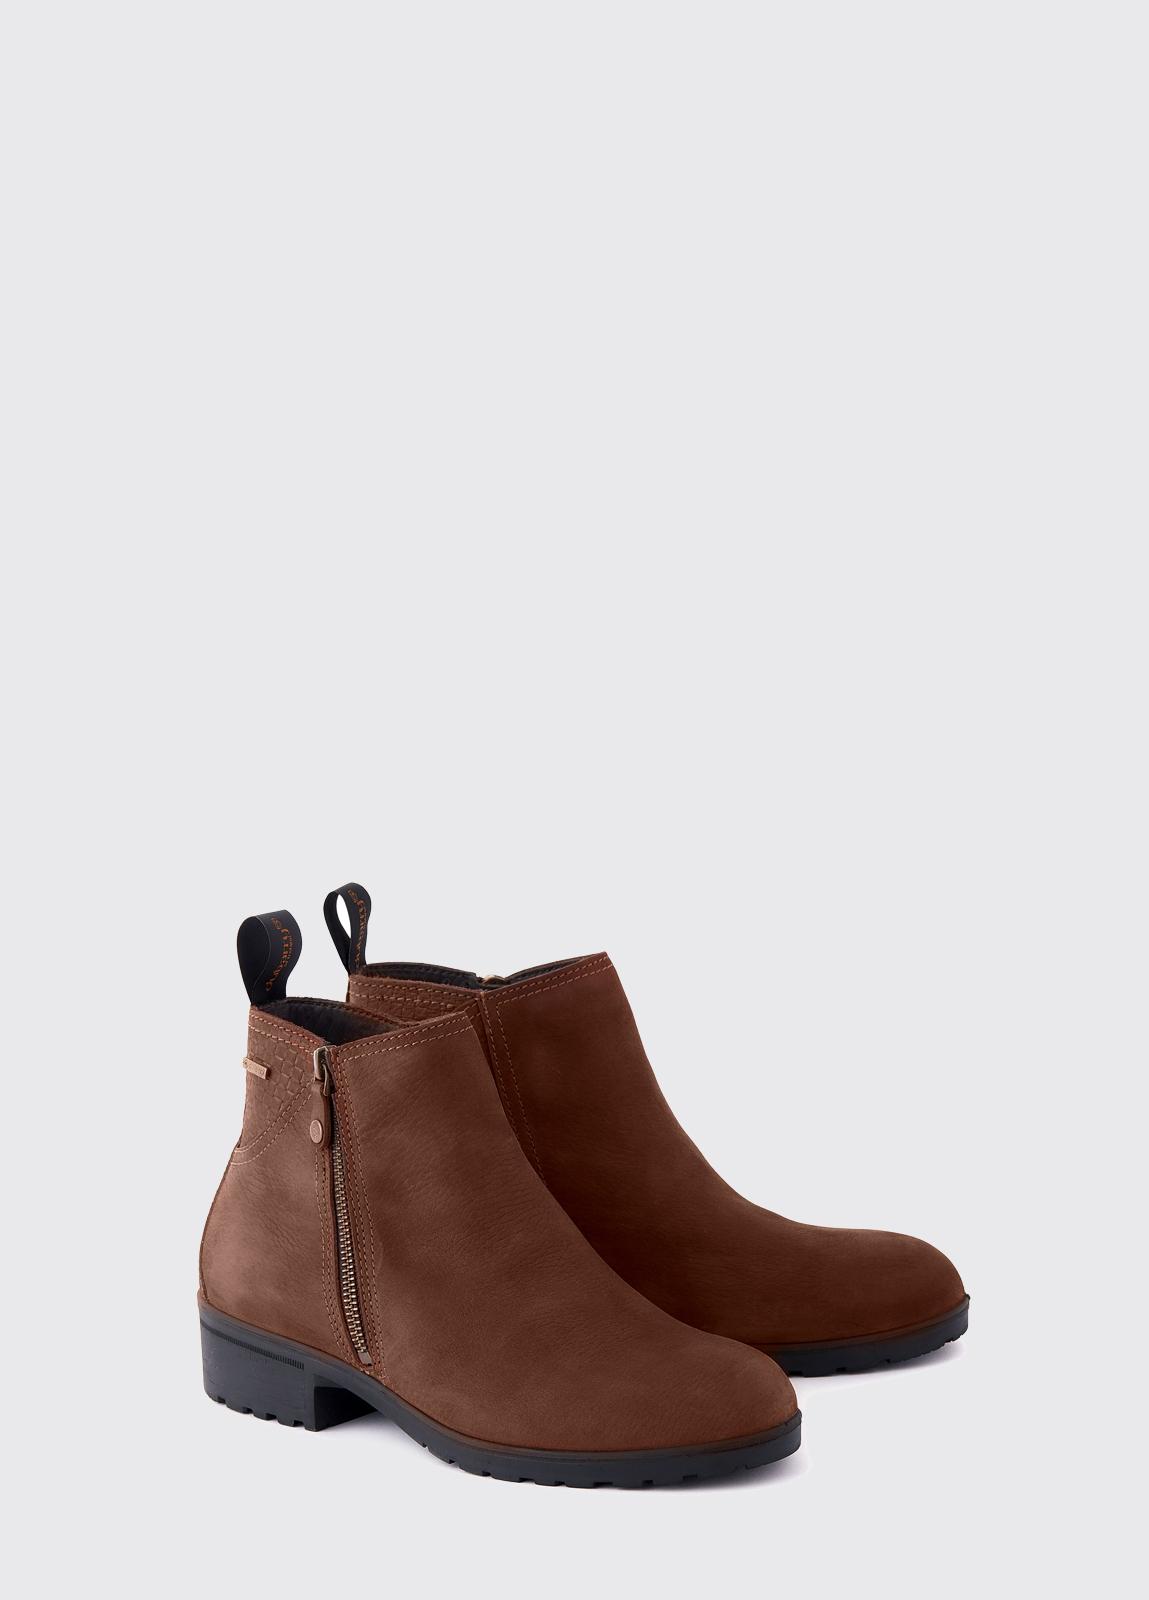 Carlow Leather Boot - Walnut